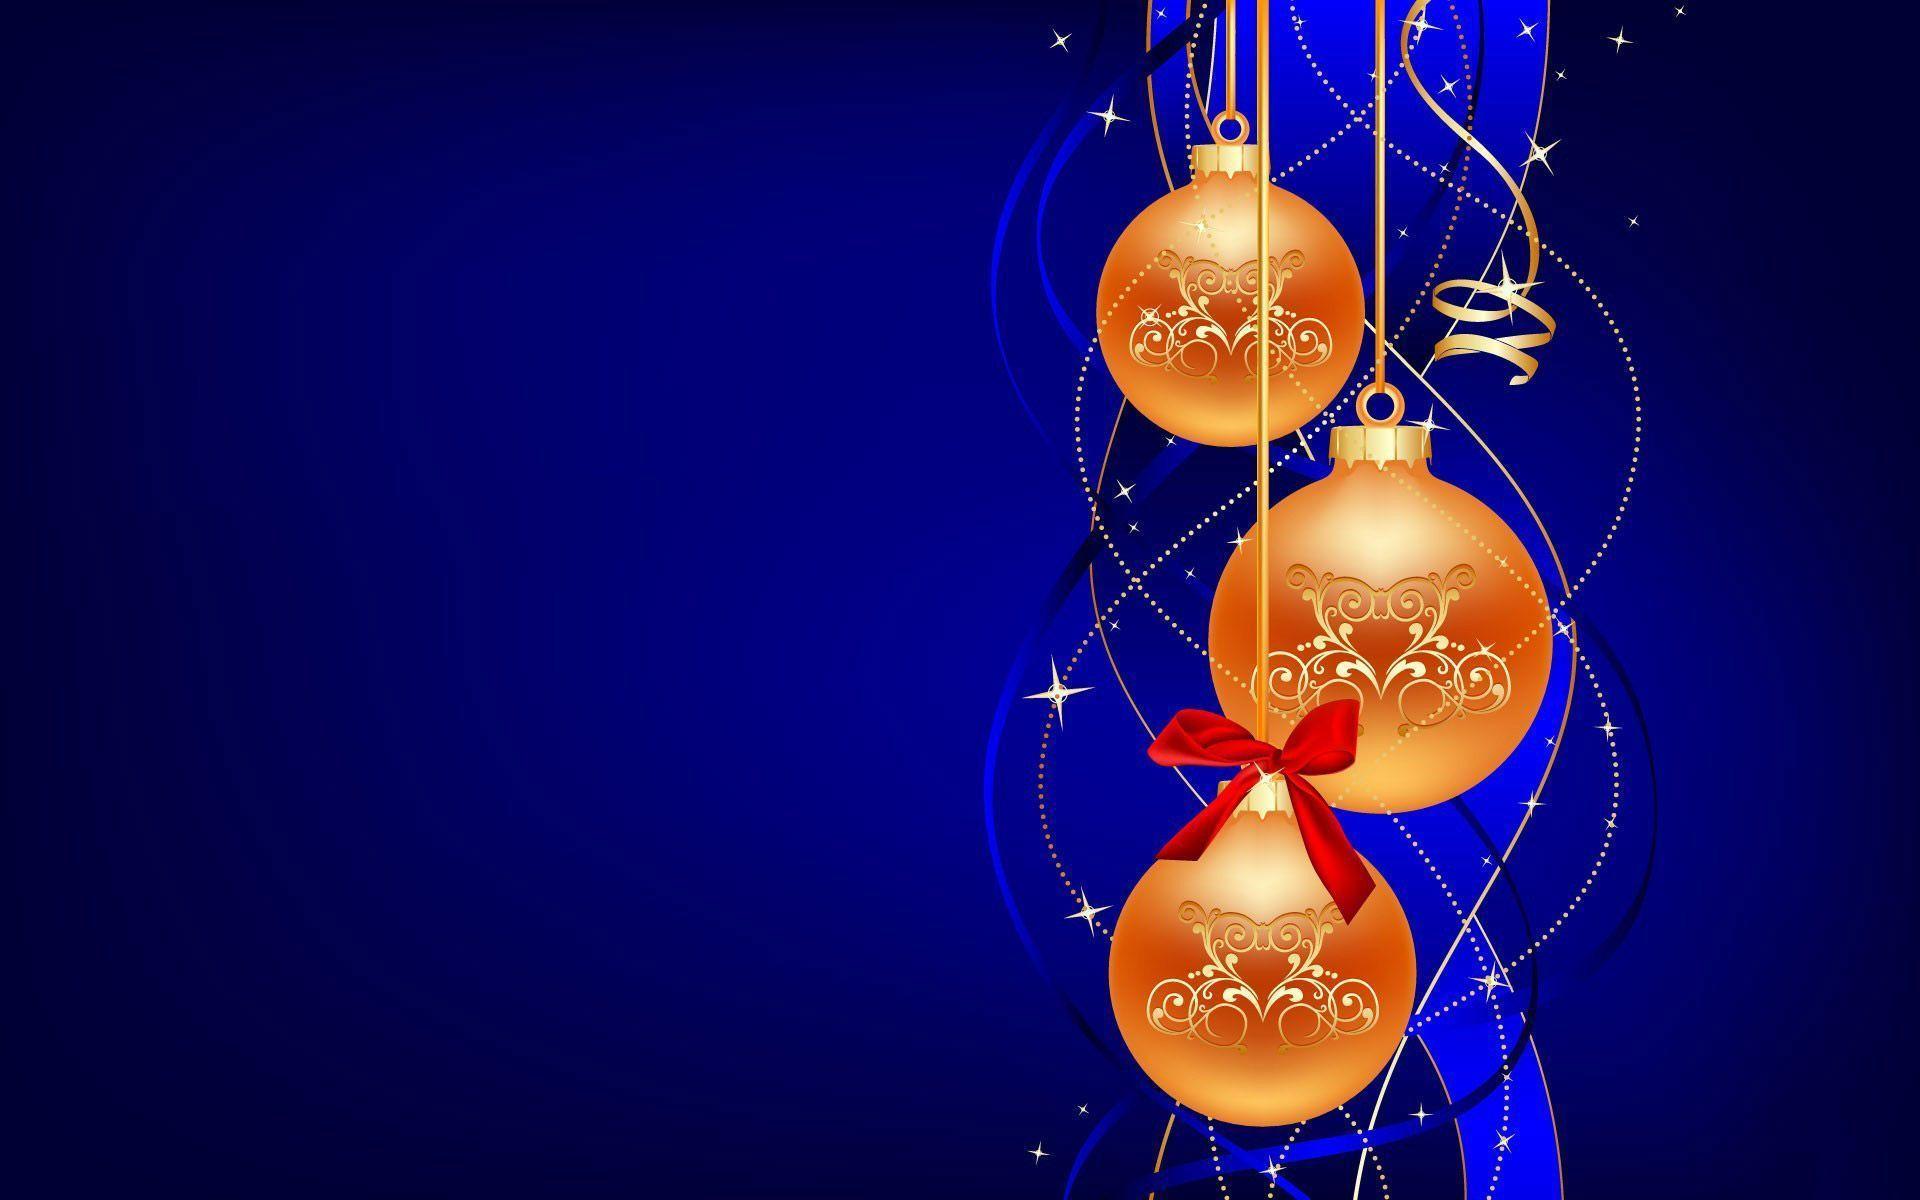 Free Backgrounds Christmas Image